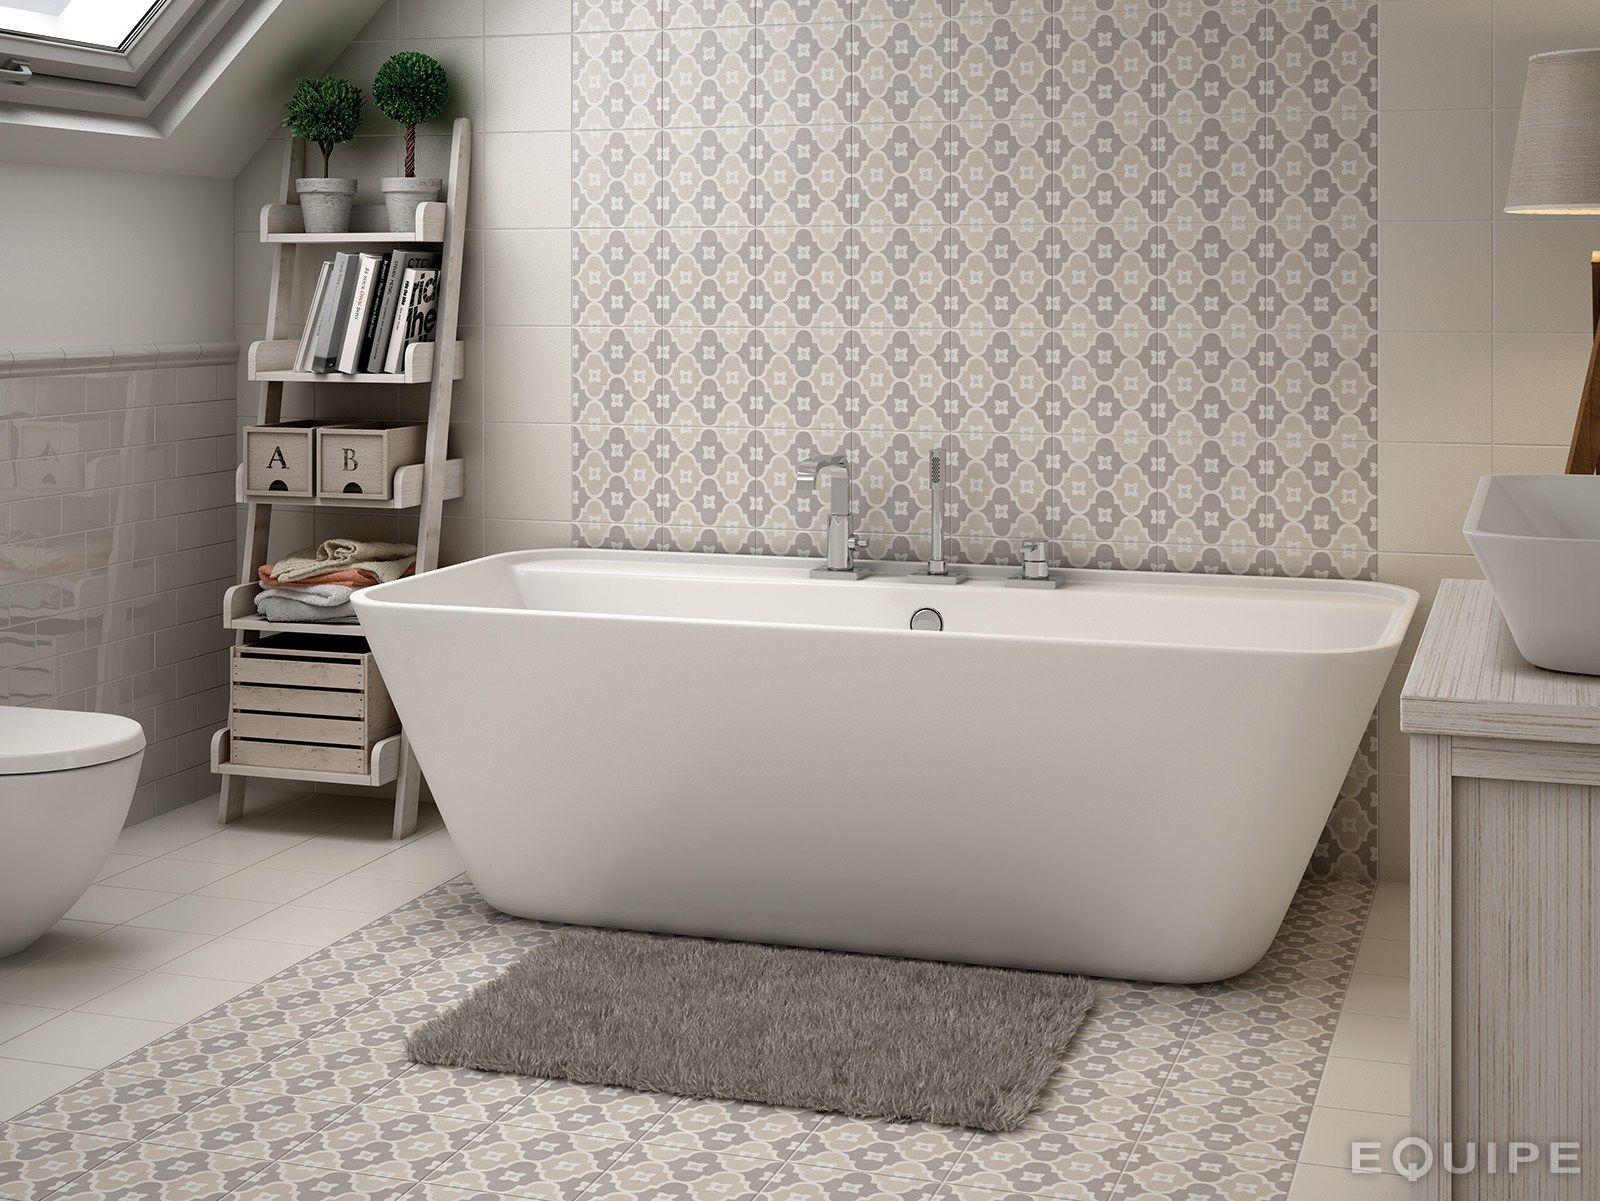 Interni Bagno ~ Caprice deco bowtie pastel bagno pinterest bagno